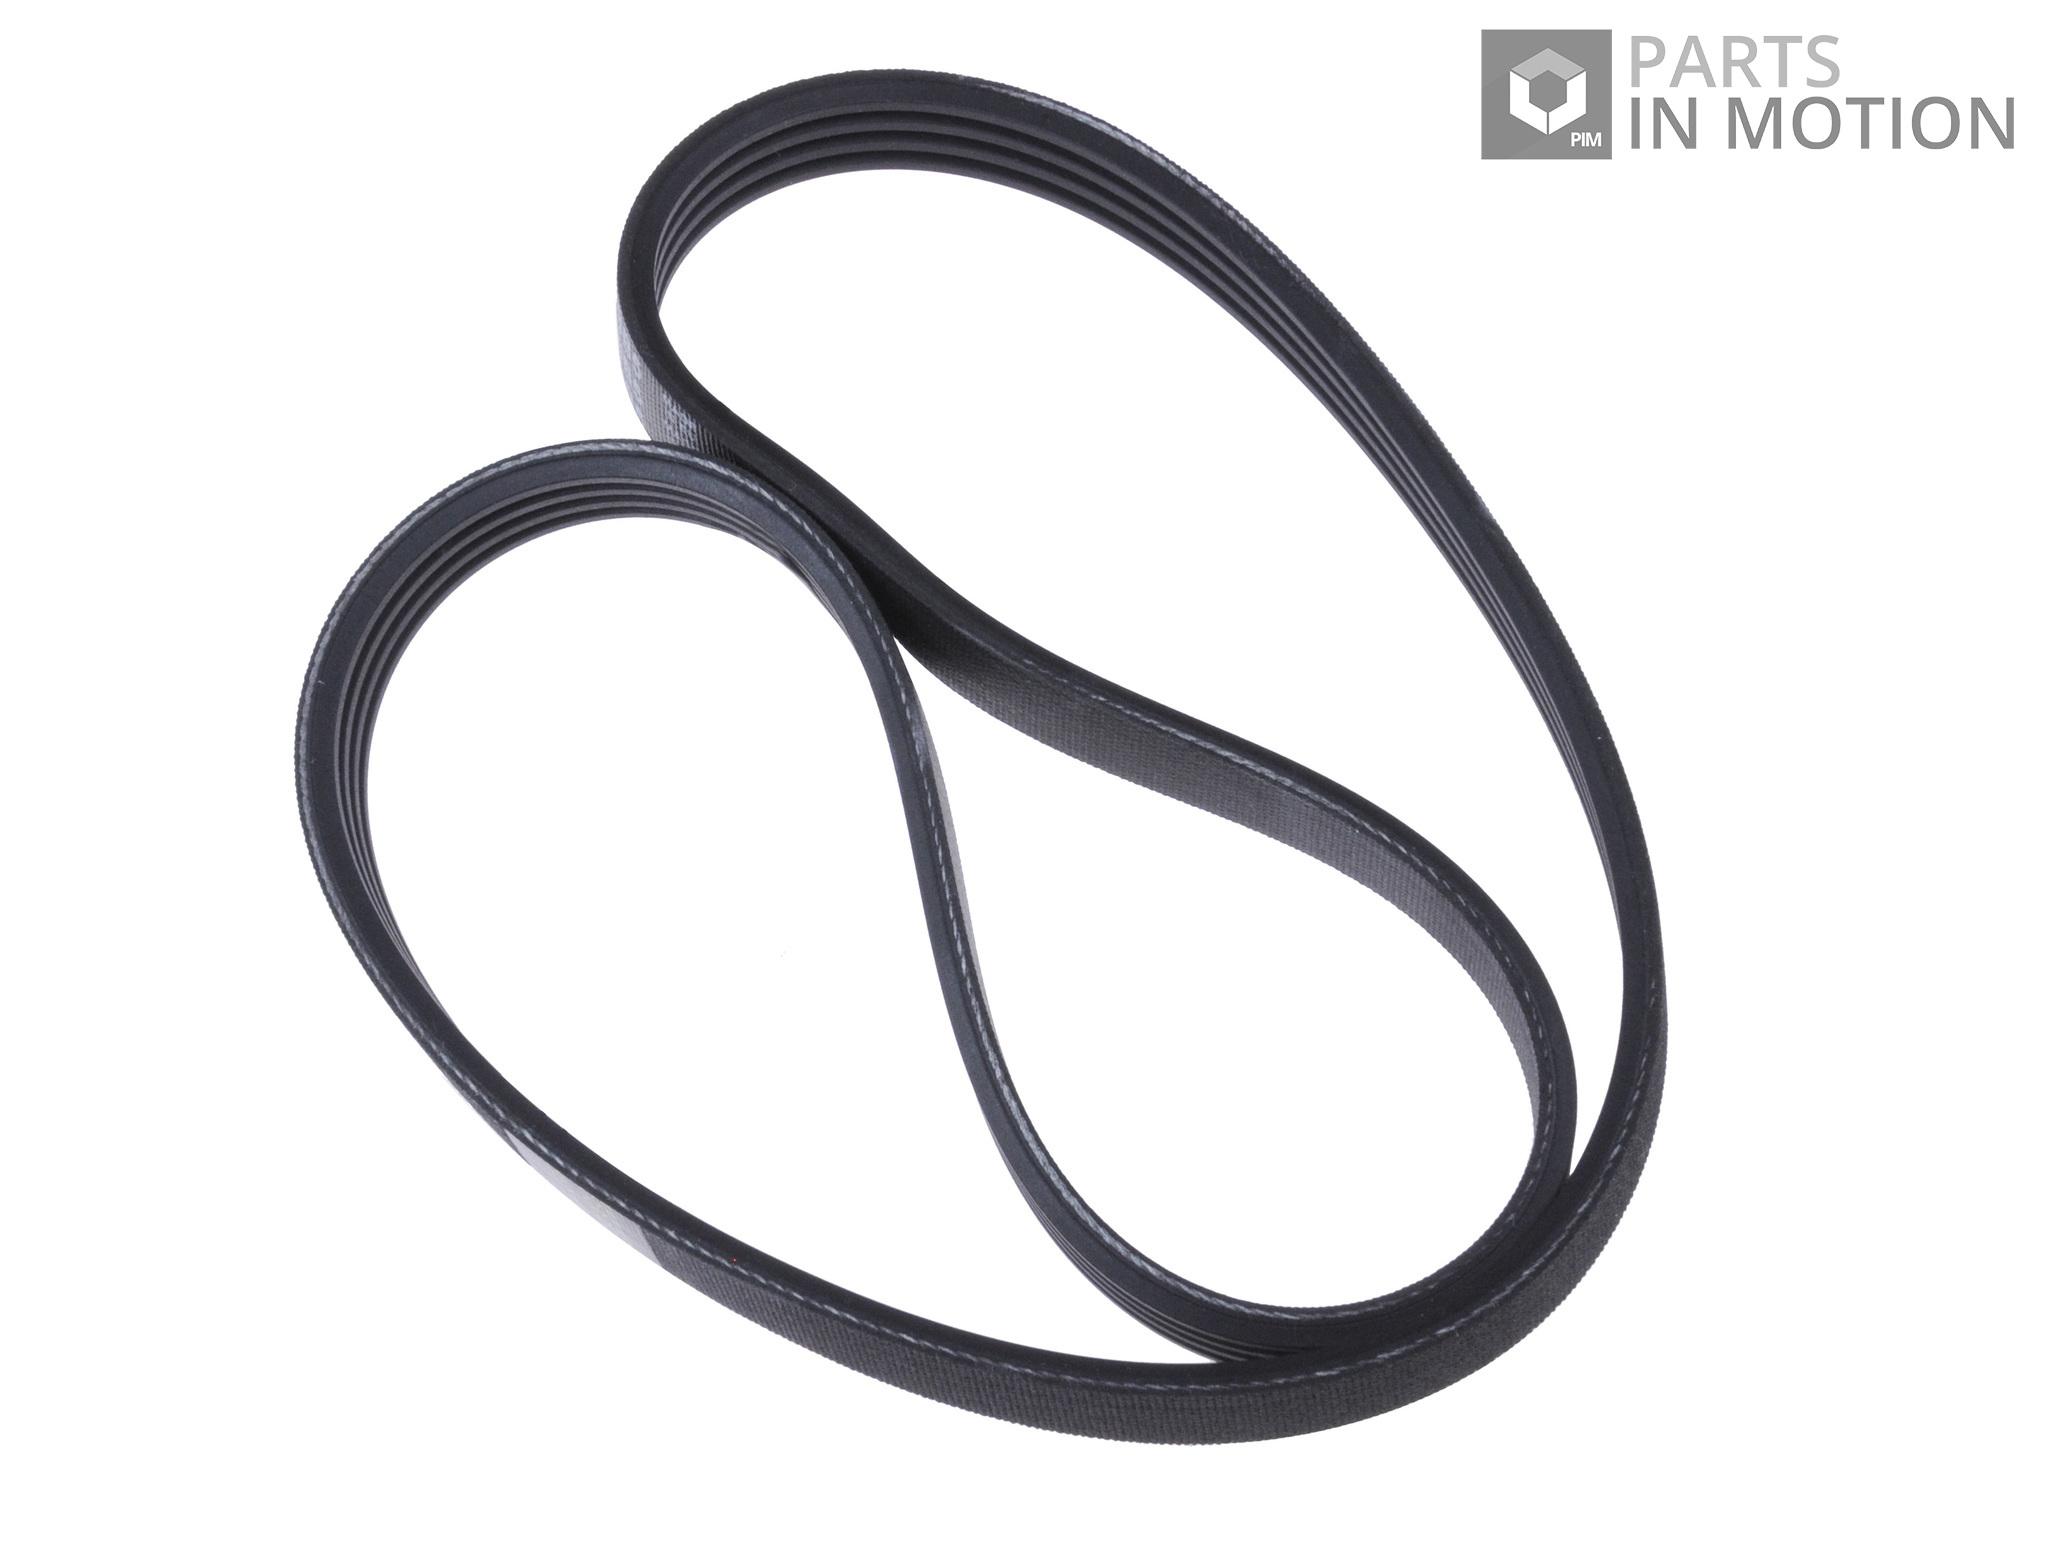 Multi V Drive Belt Fits Nissan Micra K11 13 92 To 00 Cg13de Adl Timing Saab 9 5 Blue Print Ad04r648